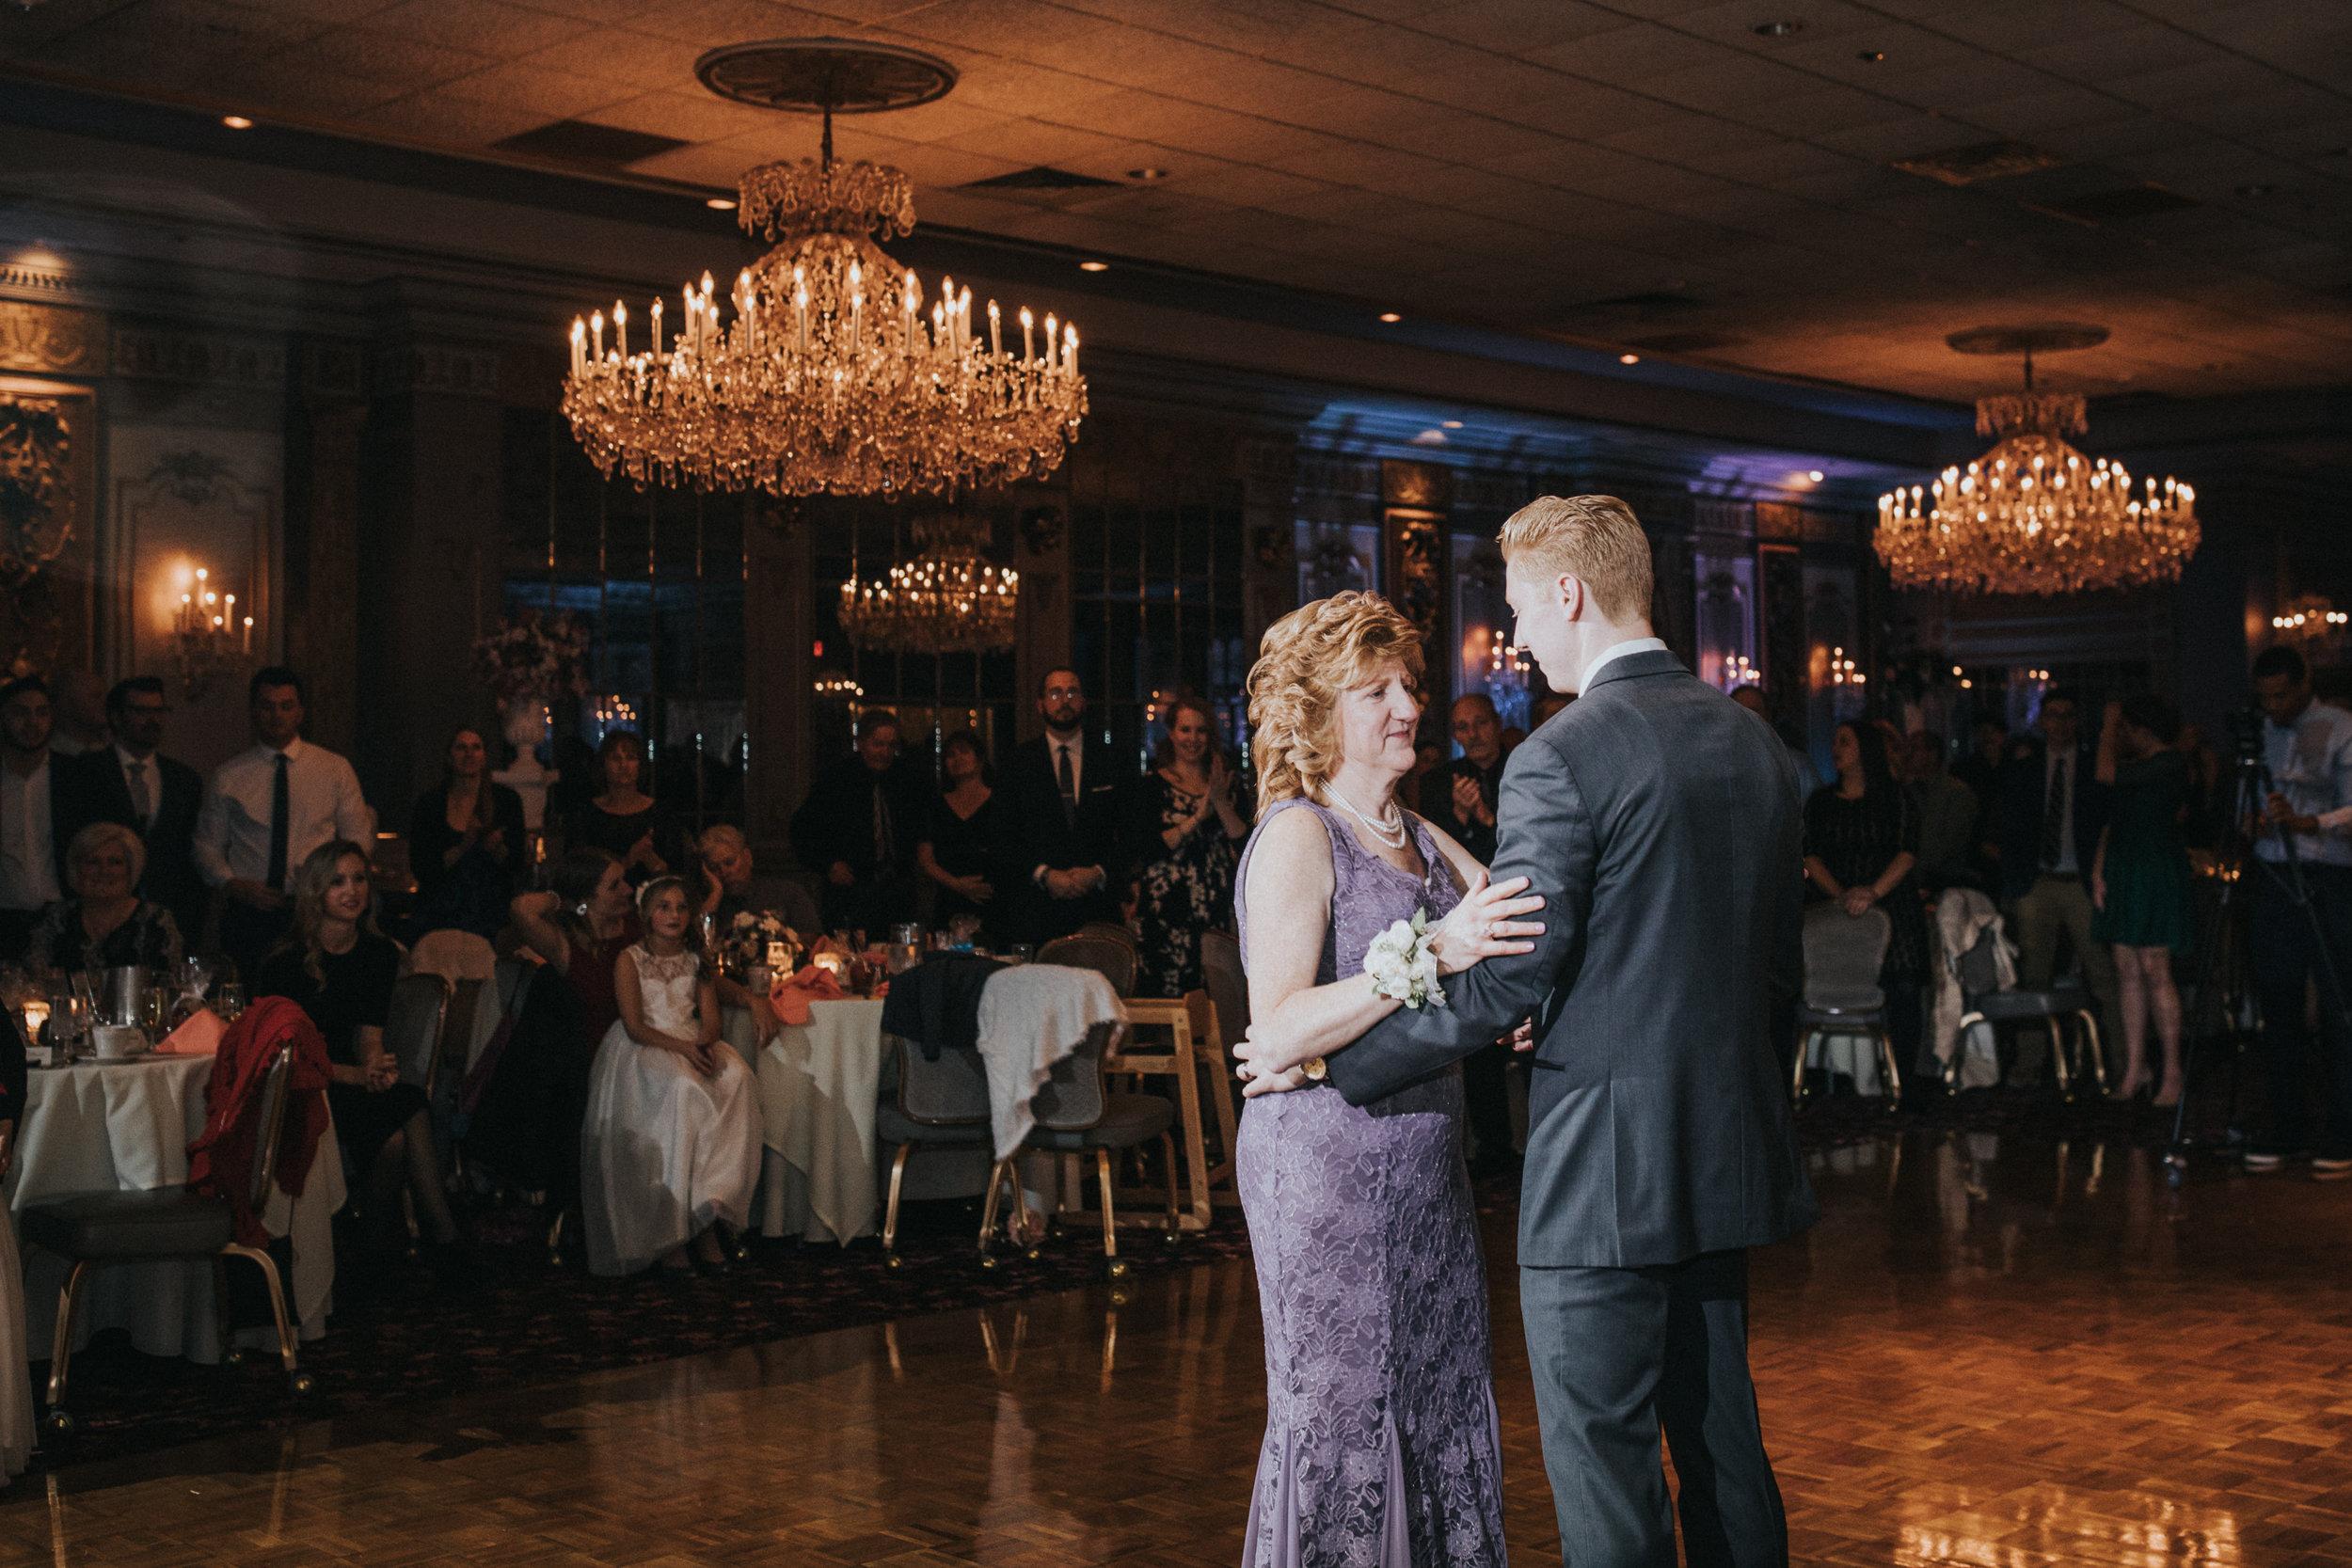 New-Jersey-Wedding-Photography-Fishers-Tudor-House-JennaLynnPhotography-Reception-Kathleen&Eddie-36.jpg